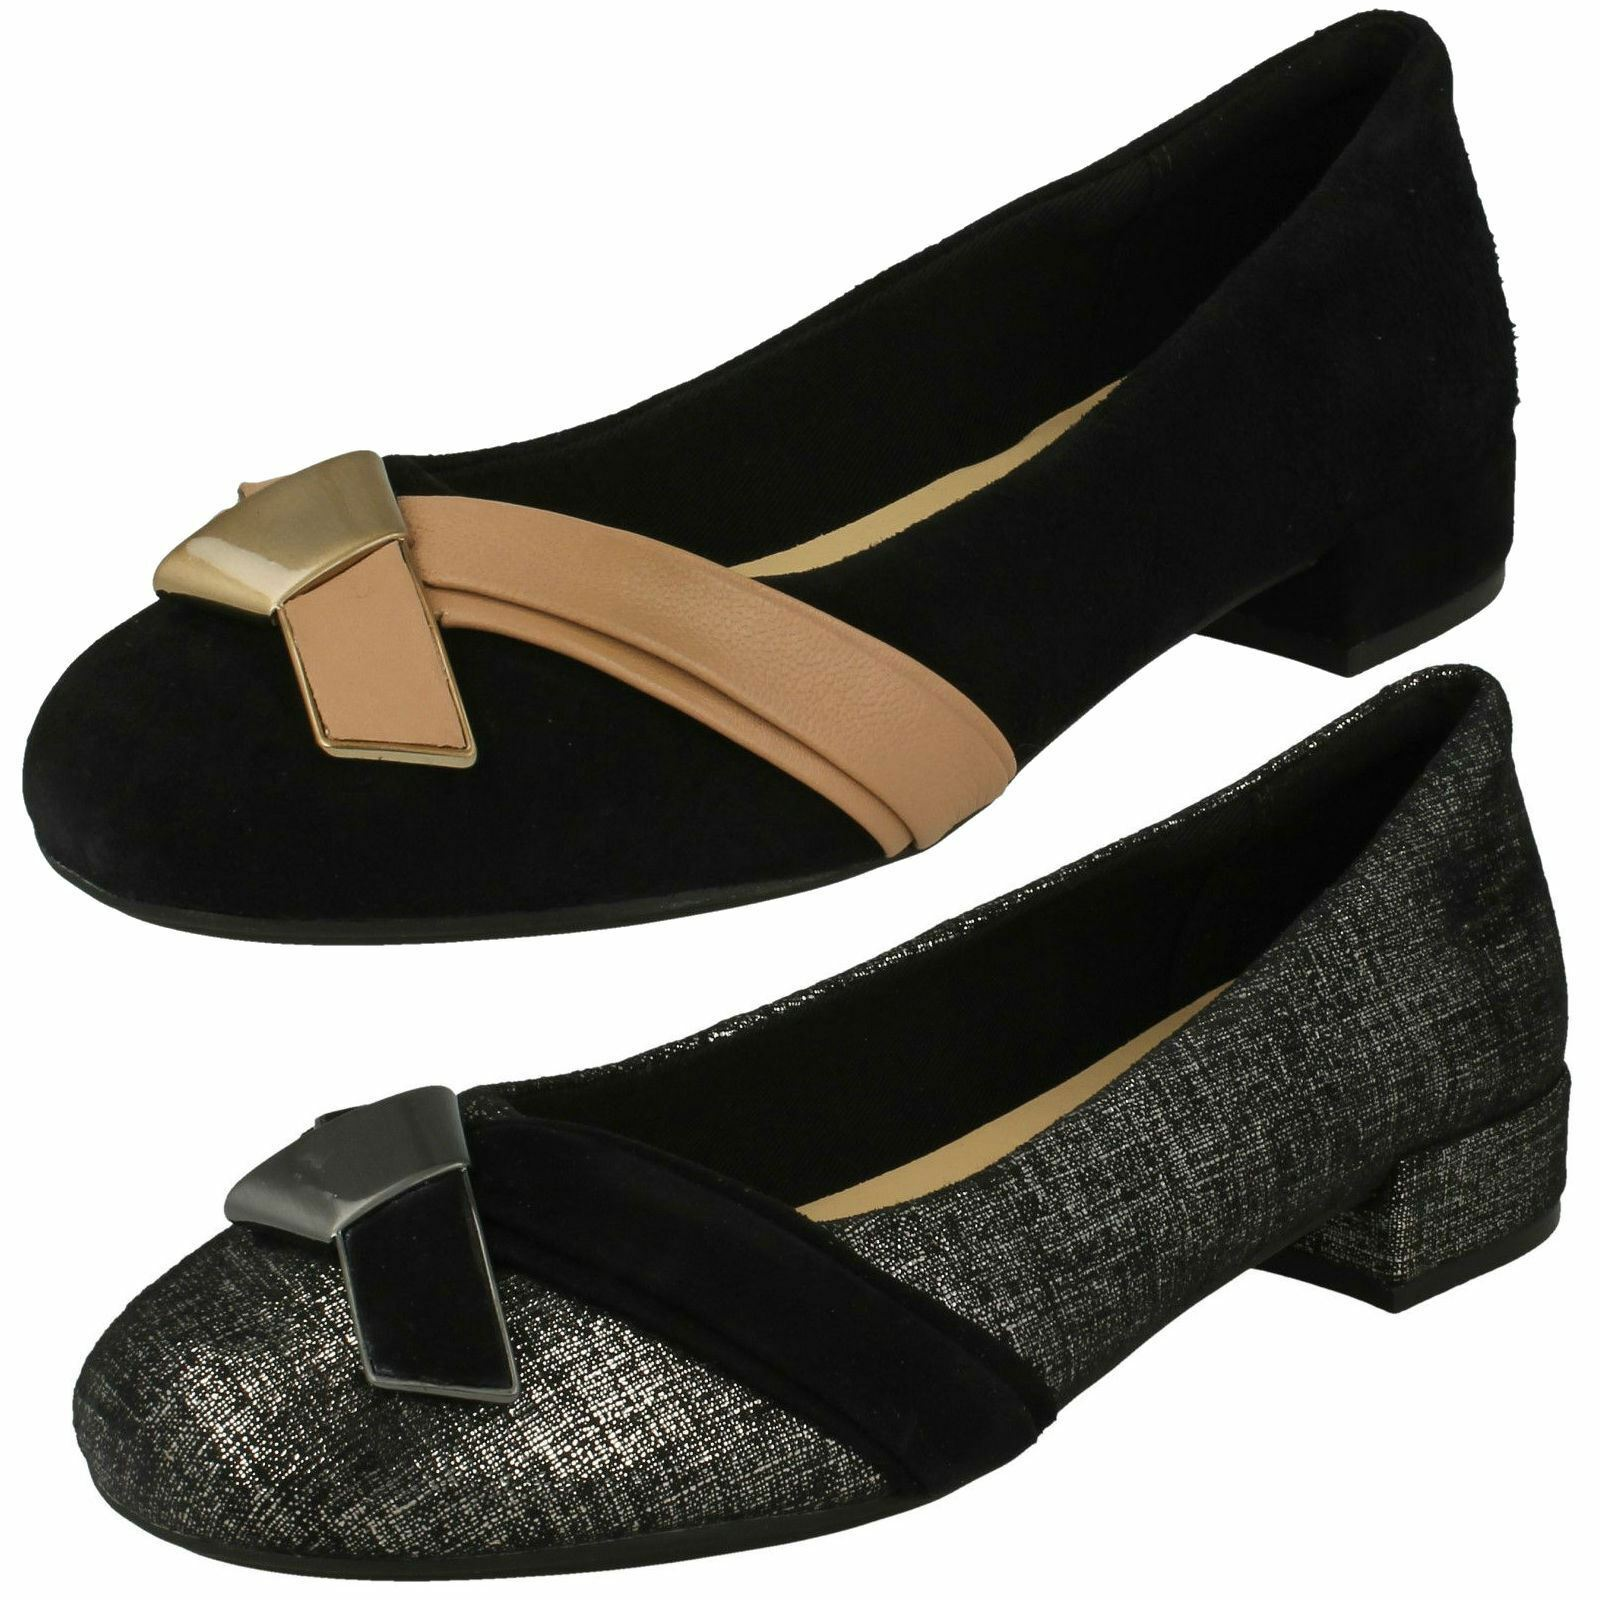 Damas Zapatos Clarks Inteligente Cruz detalle 'rosadobella 'rosadobella 'rosadobella Moon'  compras en linea